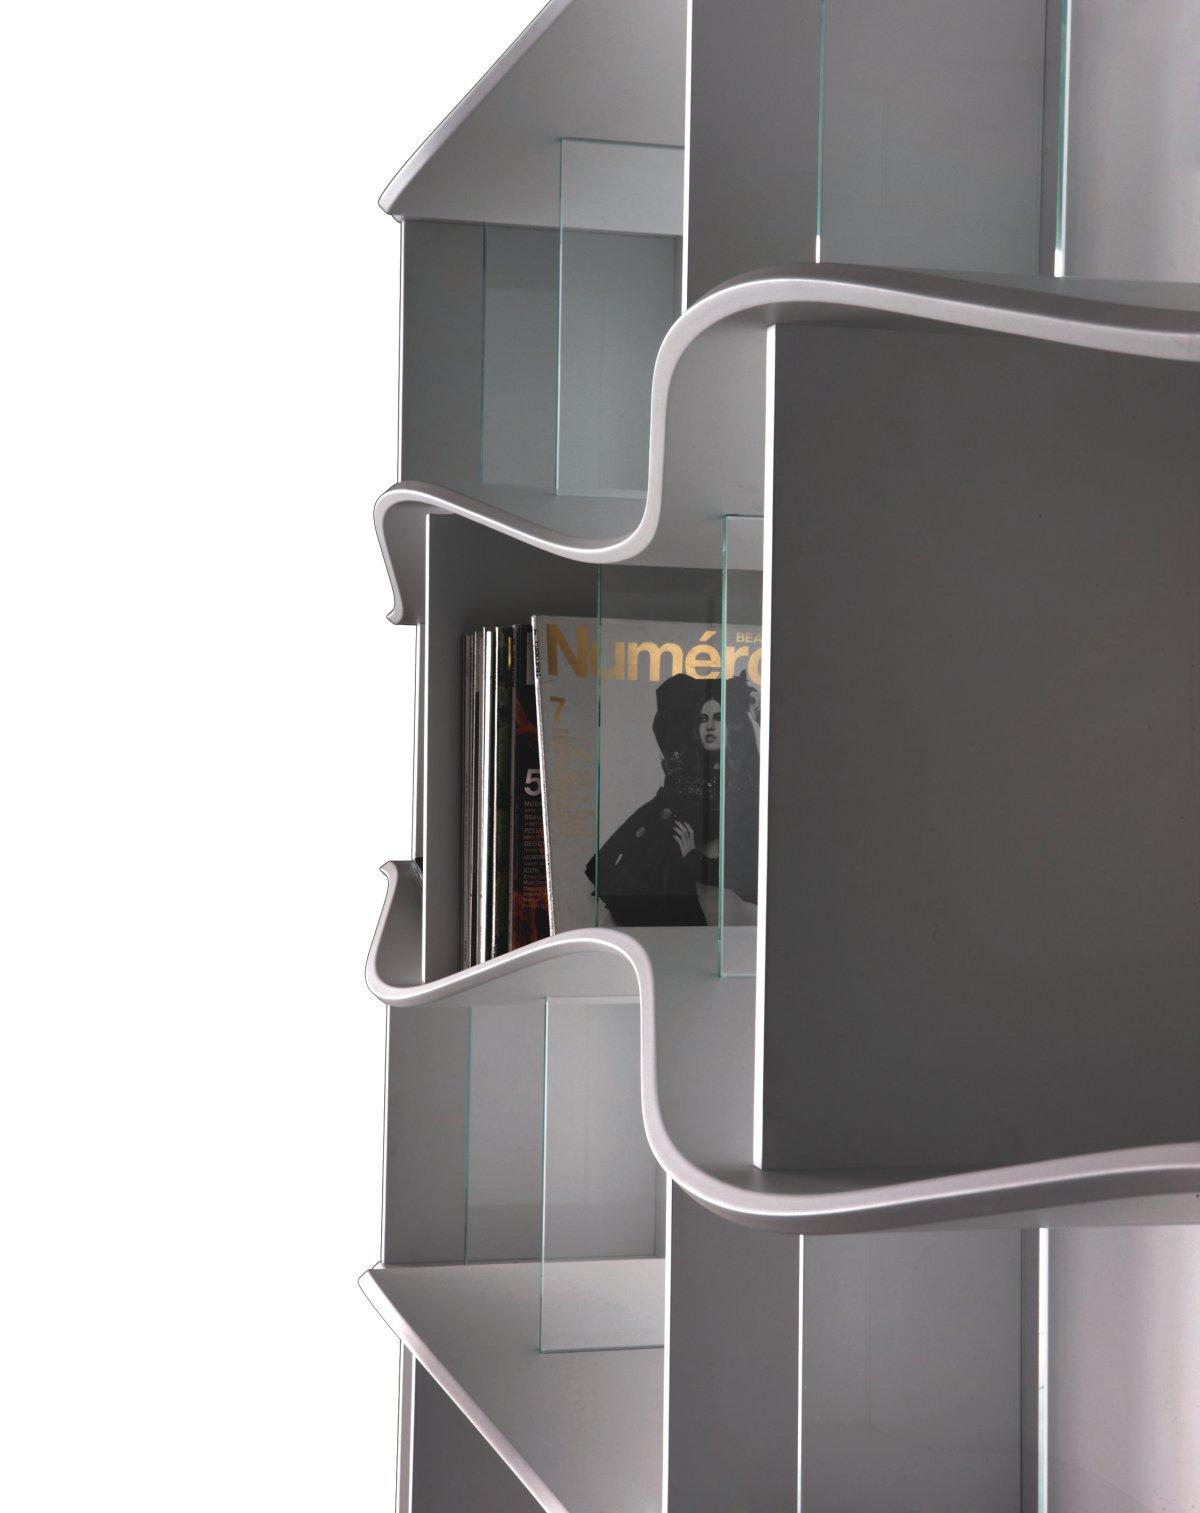 modular tv stand plans